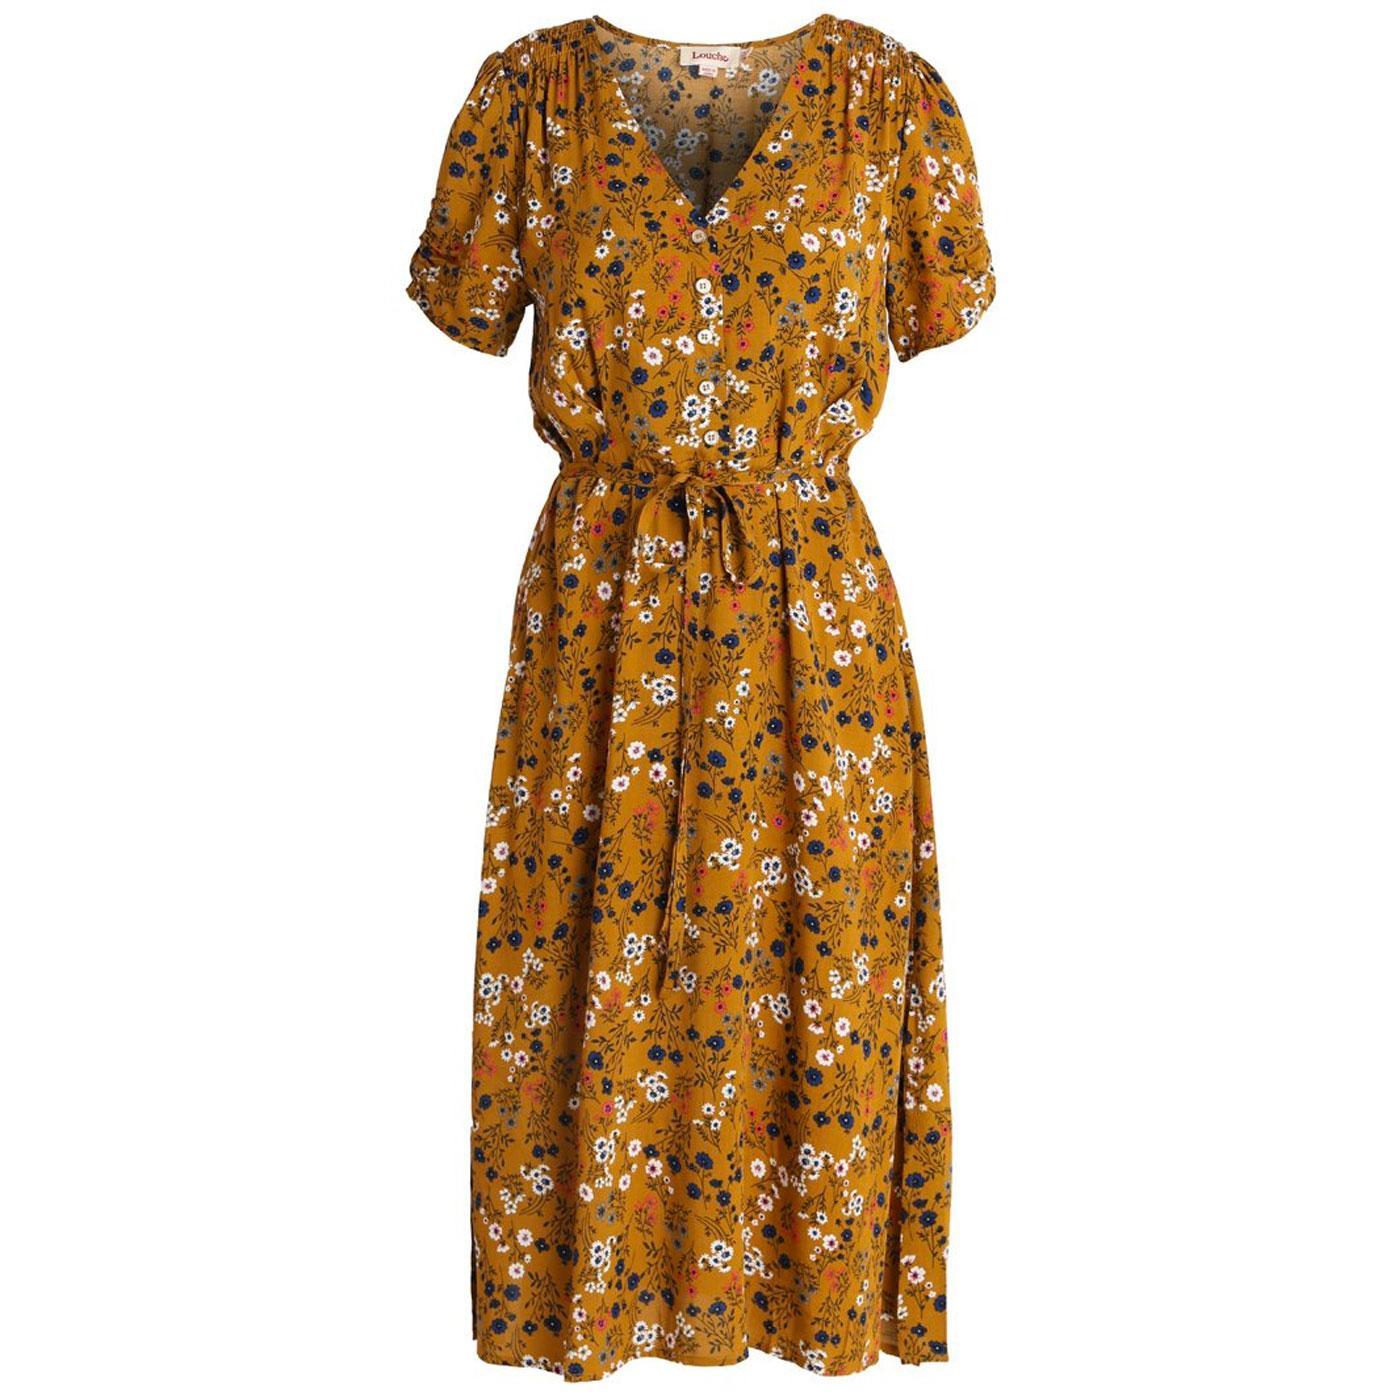 Chantel LOUCHE Retro 70s Ditsy Long Tea Dress